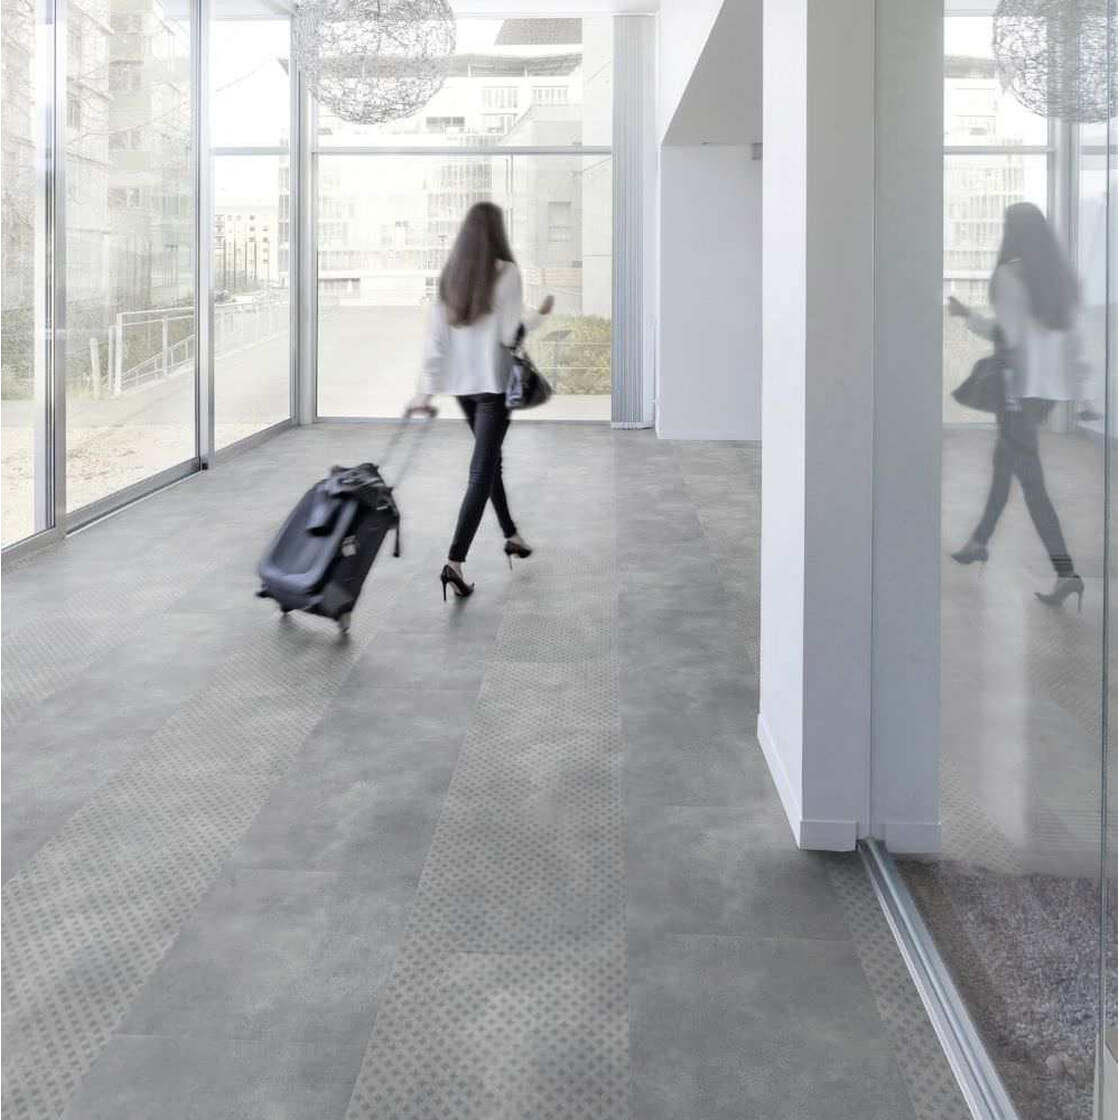 Pavimento In Cemento Prezzi pavimento pvc effetto cemento - gerflor geelong gray 0012 | rigid 55 lock  acoustic